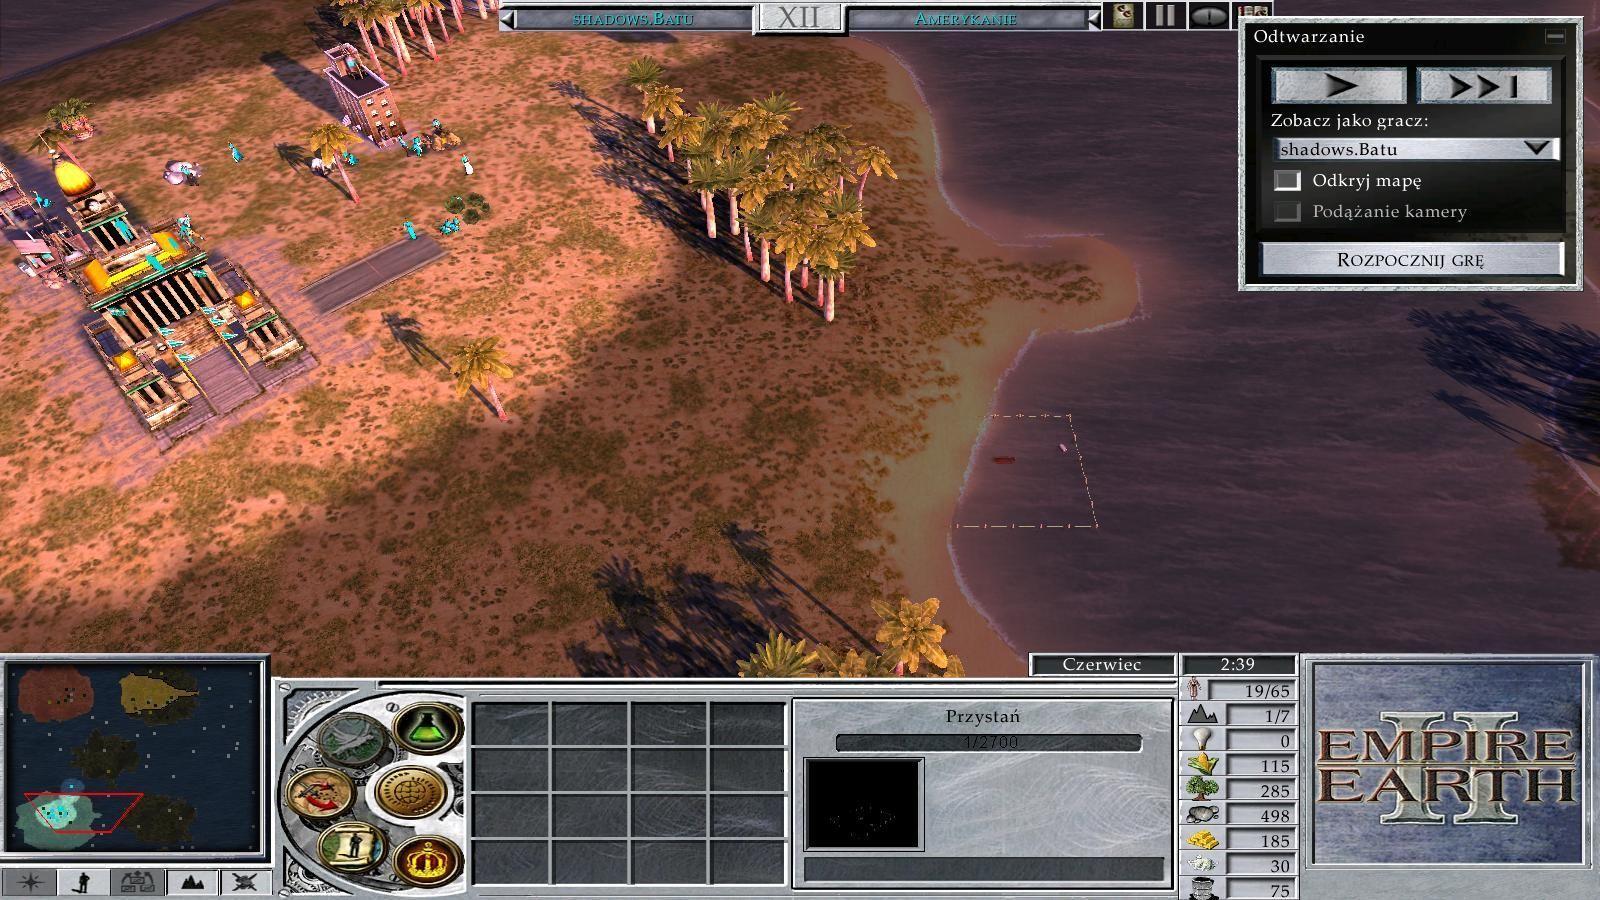 01.08.2012 [Resources Glitch] EE2_ScreenShot595-1